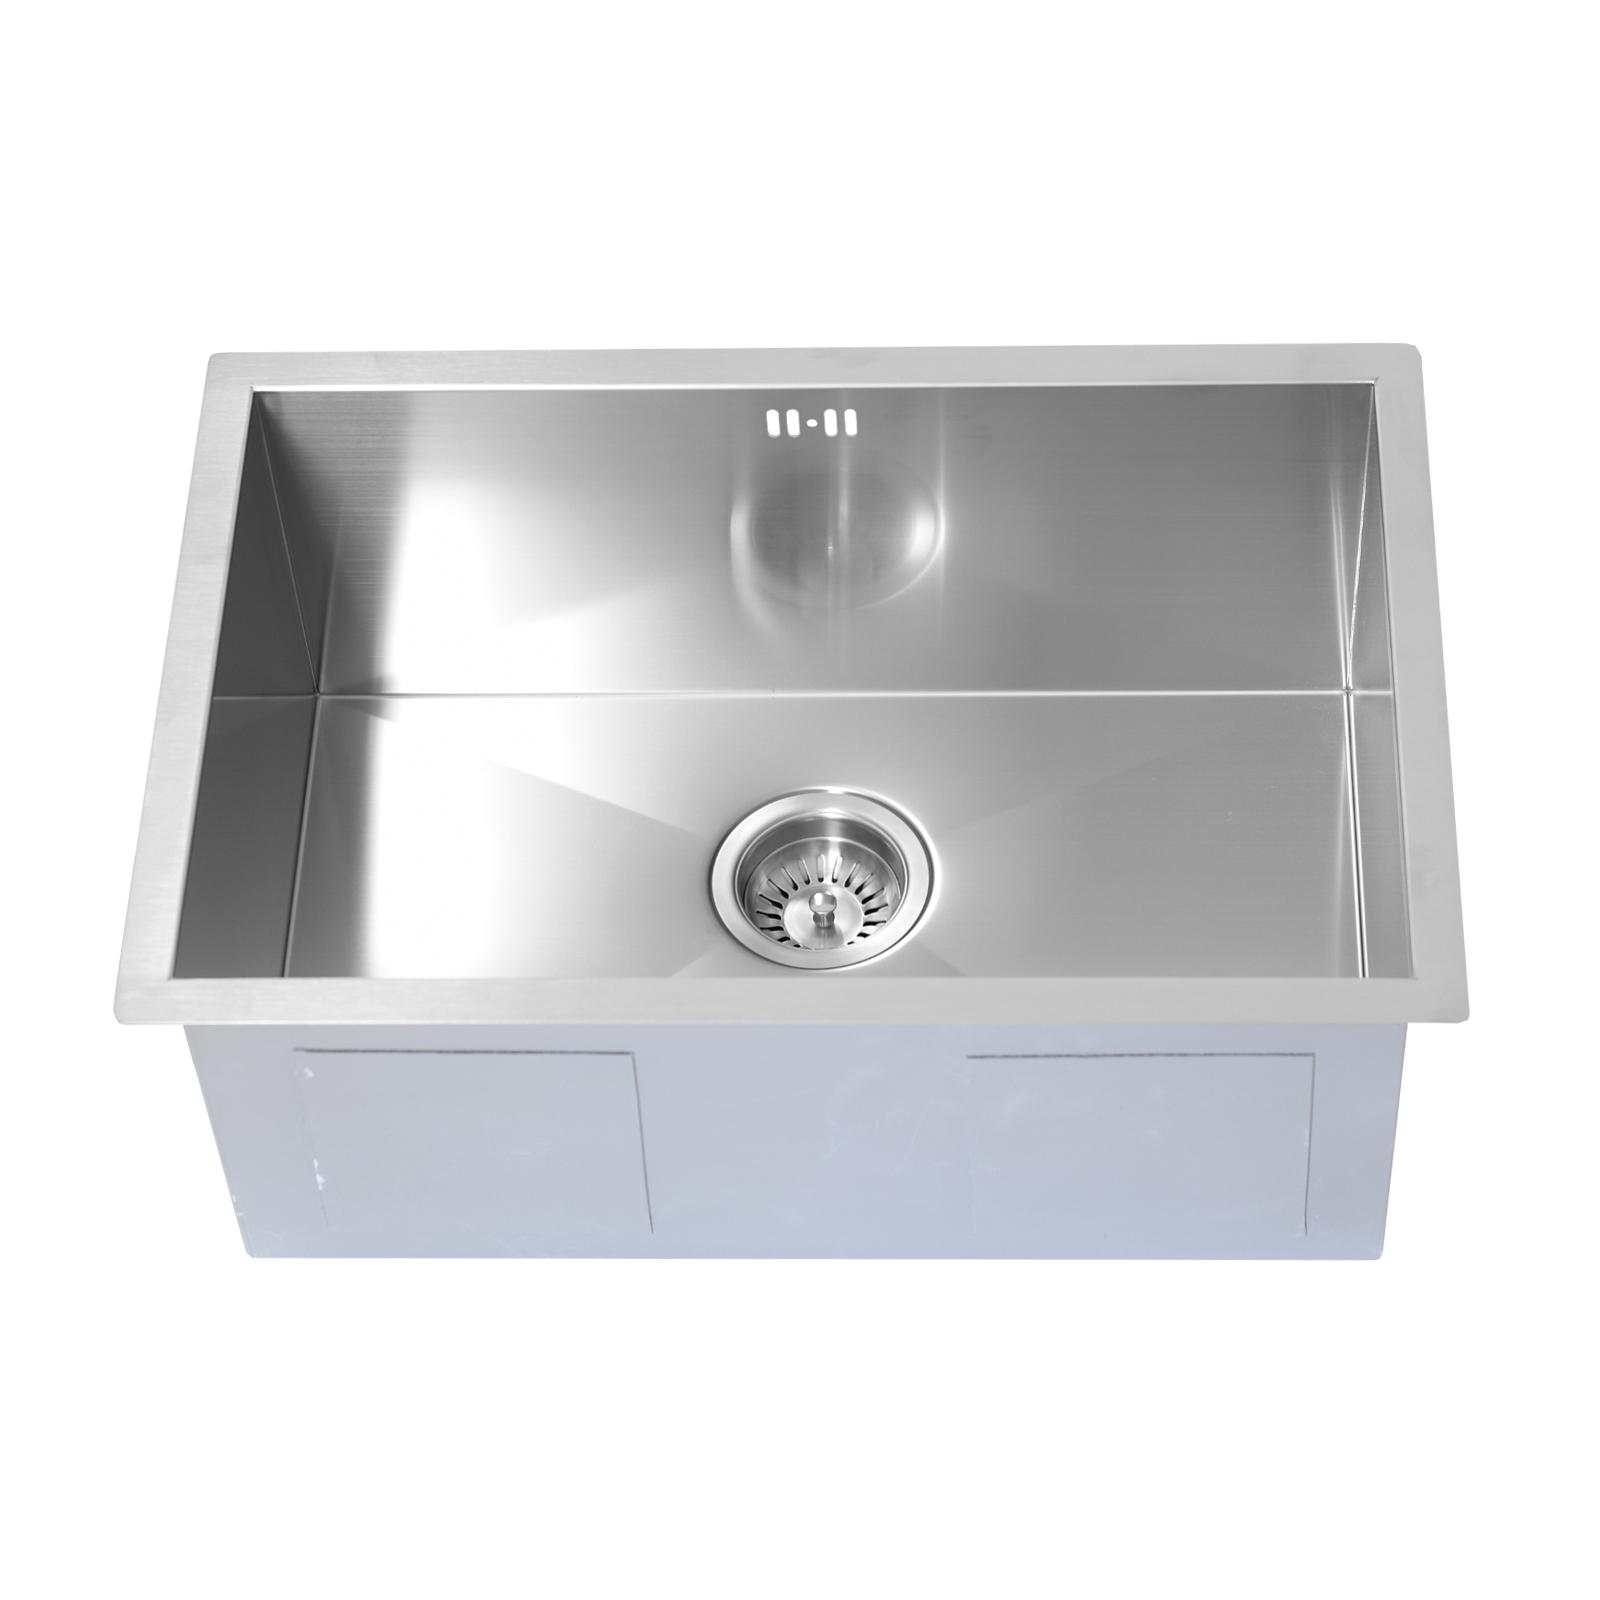 Enki single double 1 5 bowl reversible stainless steel kitchen sink - Enki Undermount Kitchen Sink Premium Stainless Steel Single